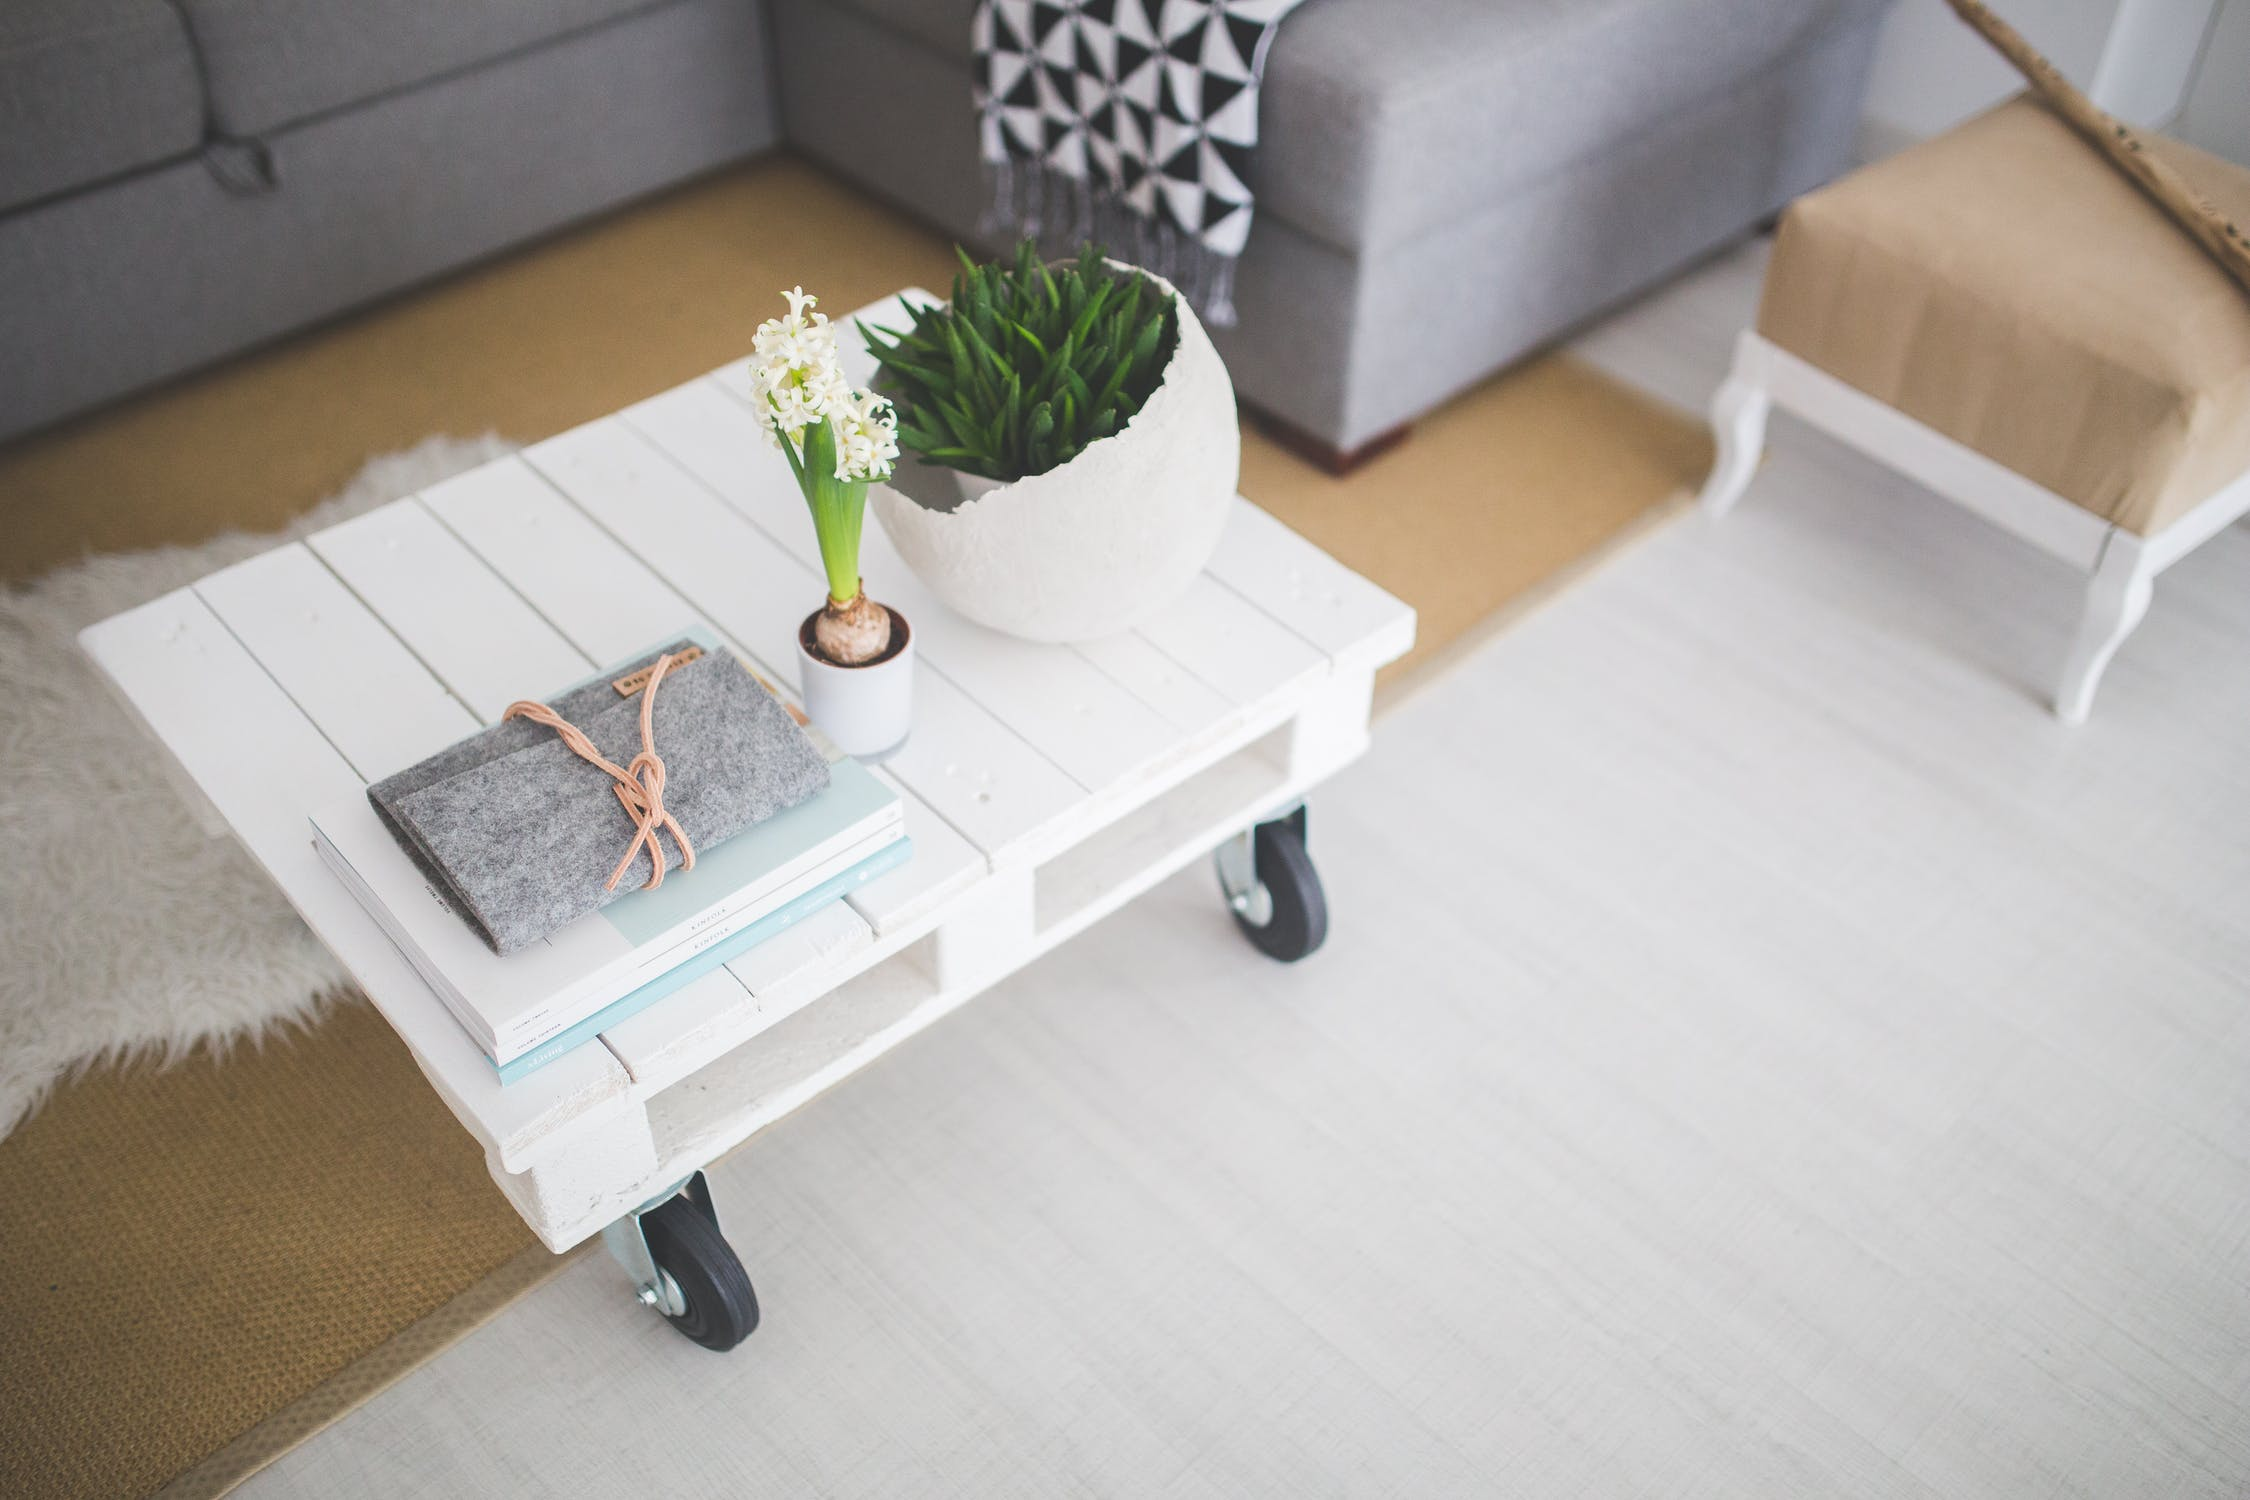 https://images.pexels.com/photos/6412/table-white-home-interior.jpg?w=1260&h=750&dpr=2&auto=compress&cs=tinysrgb